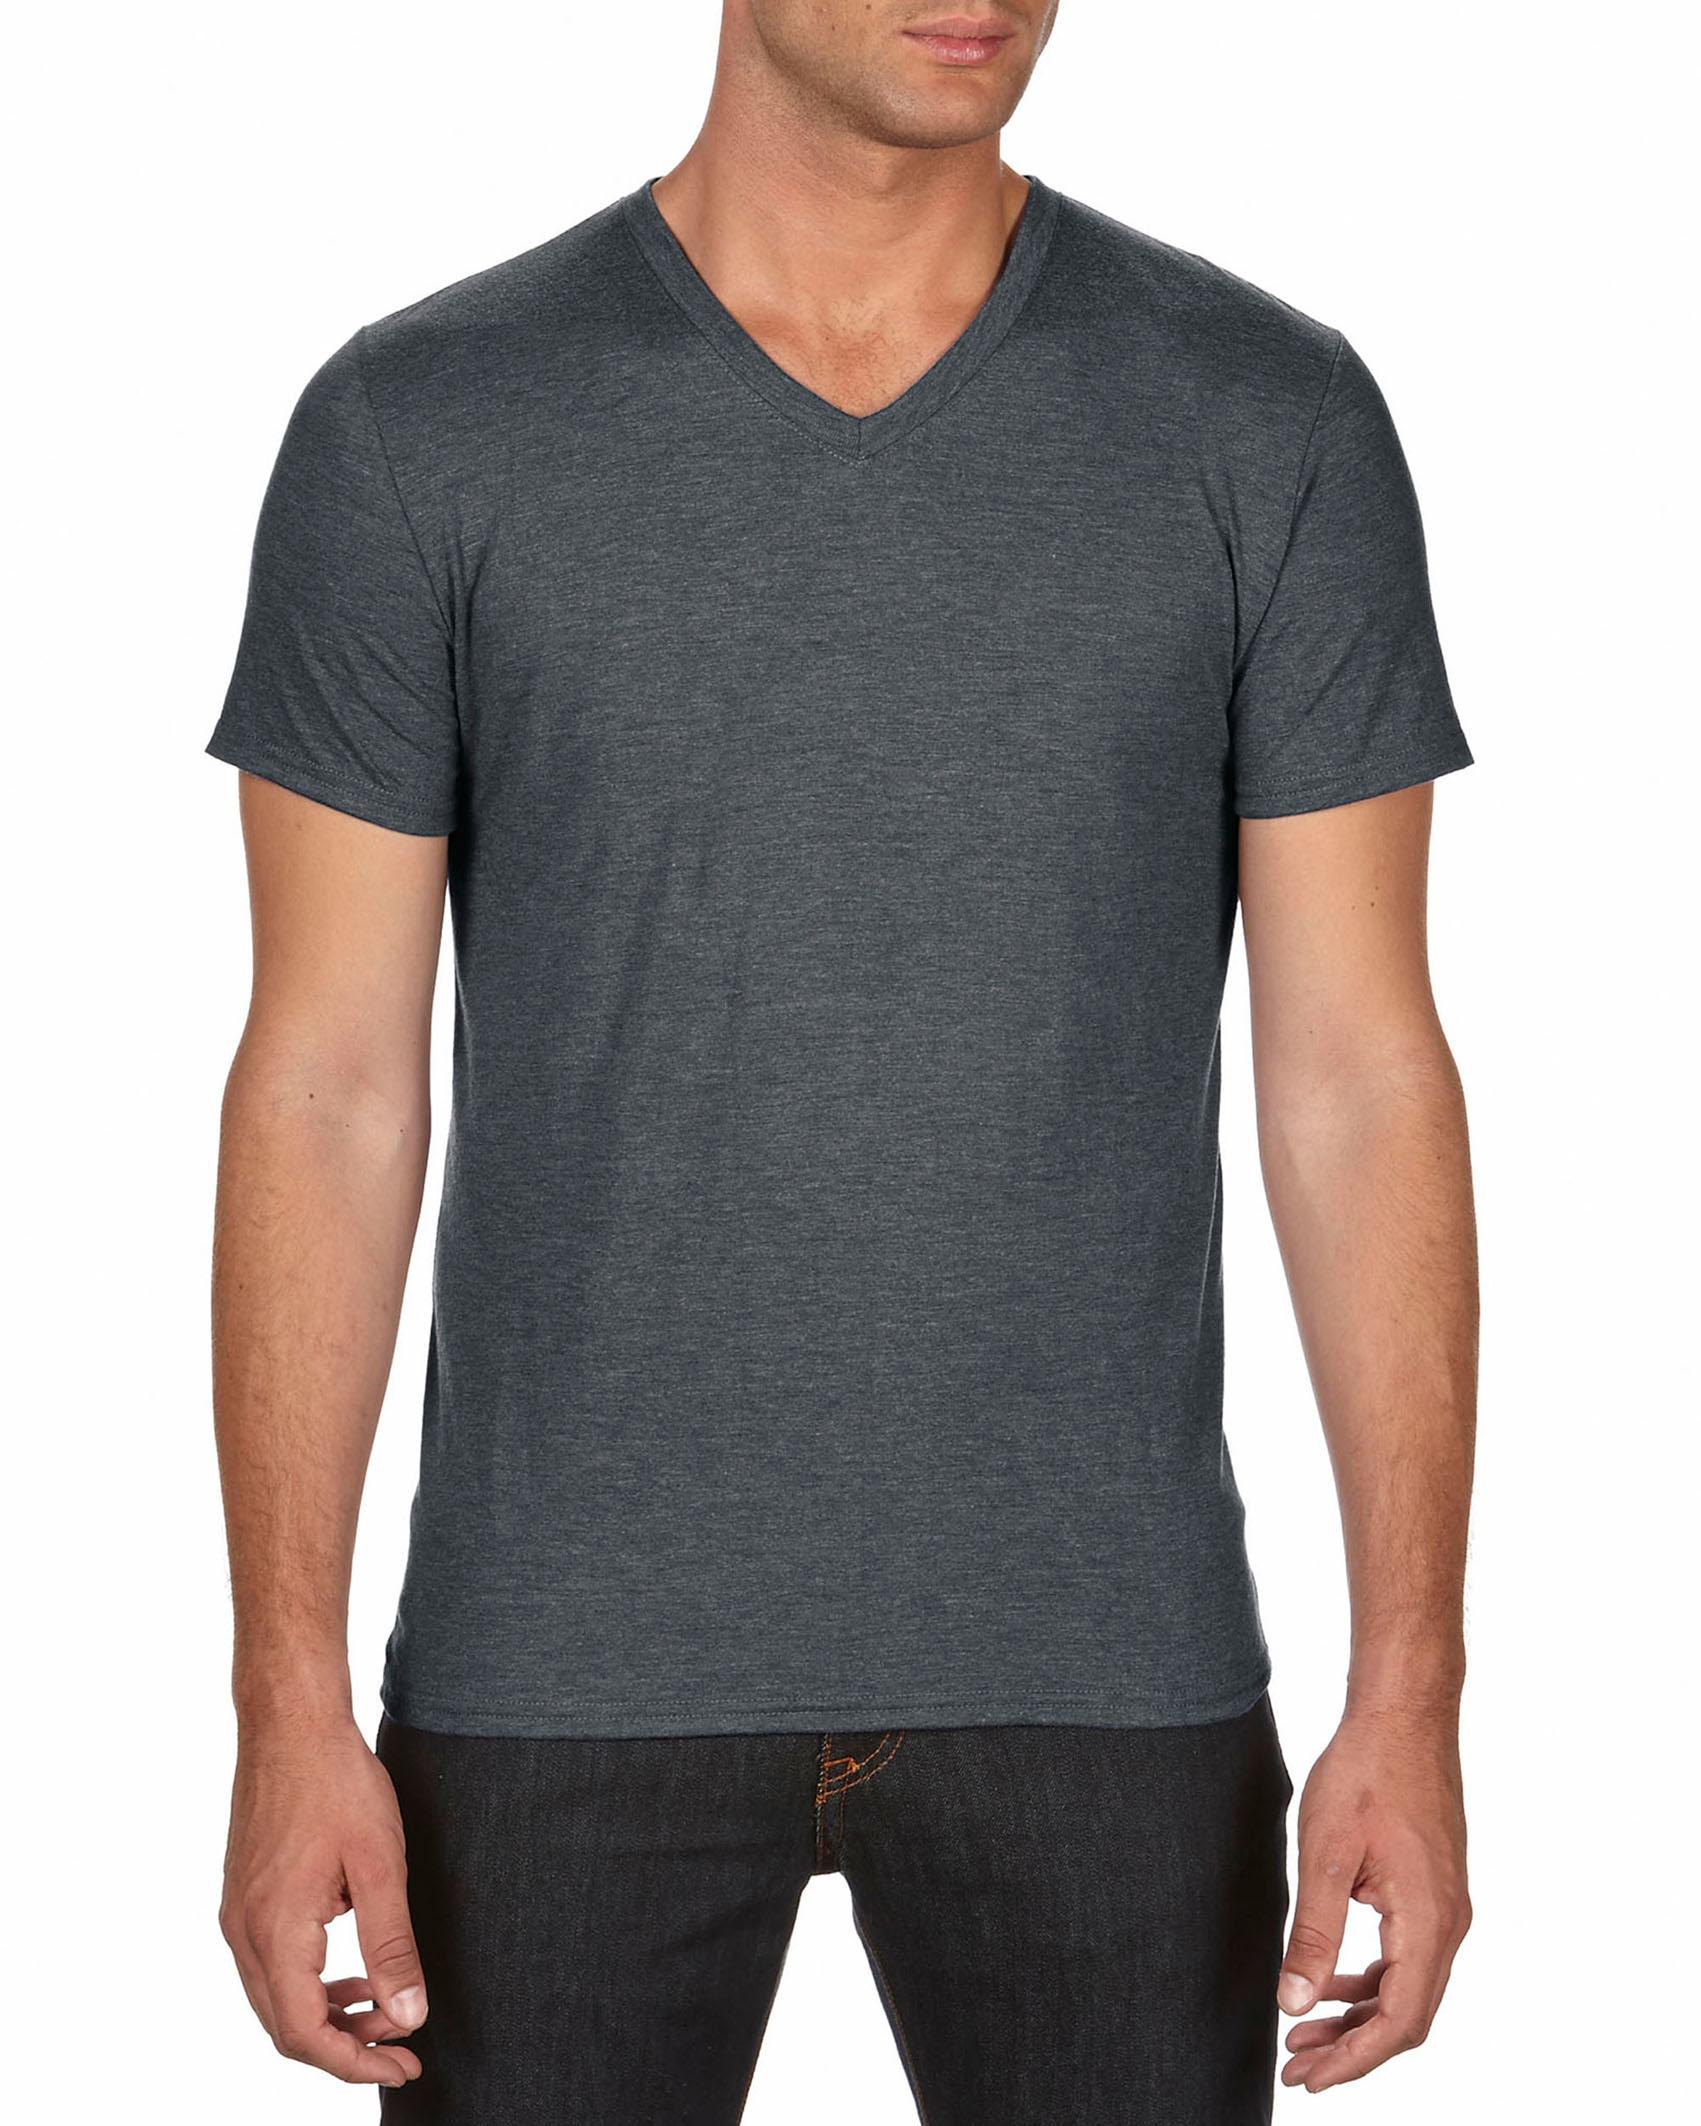 heather dark grey